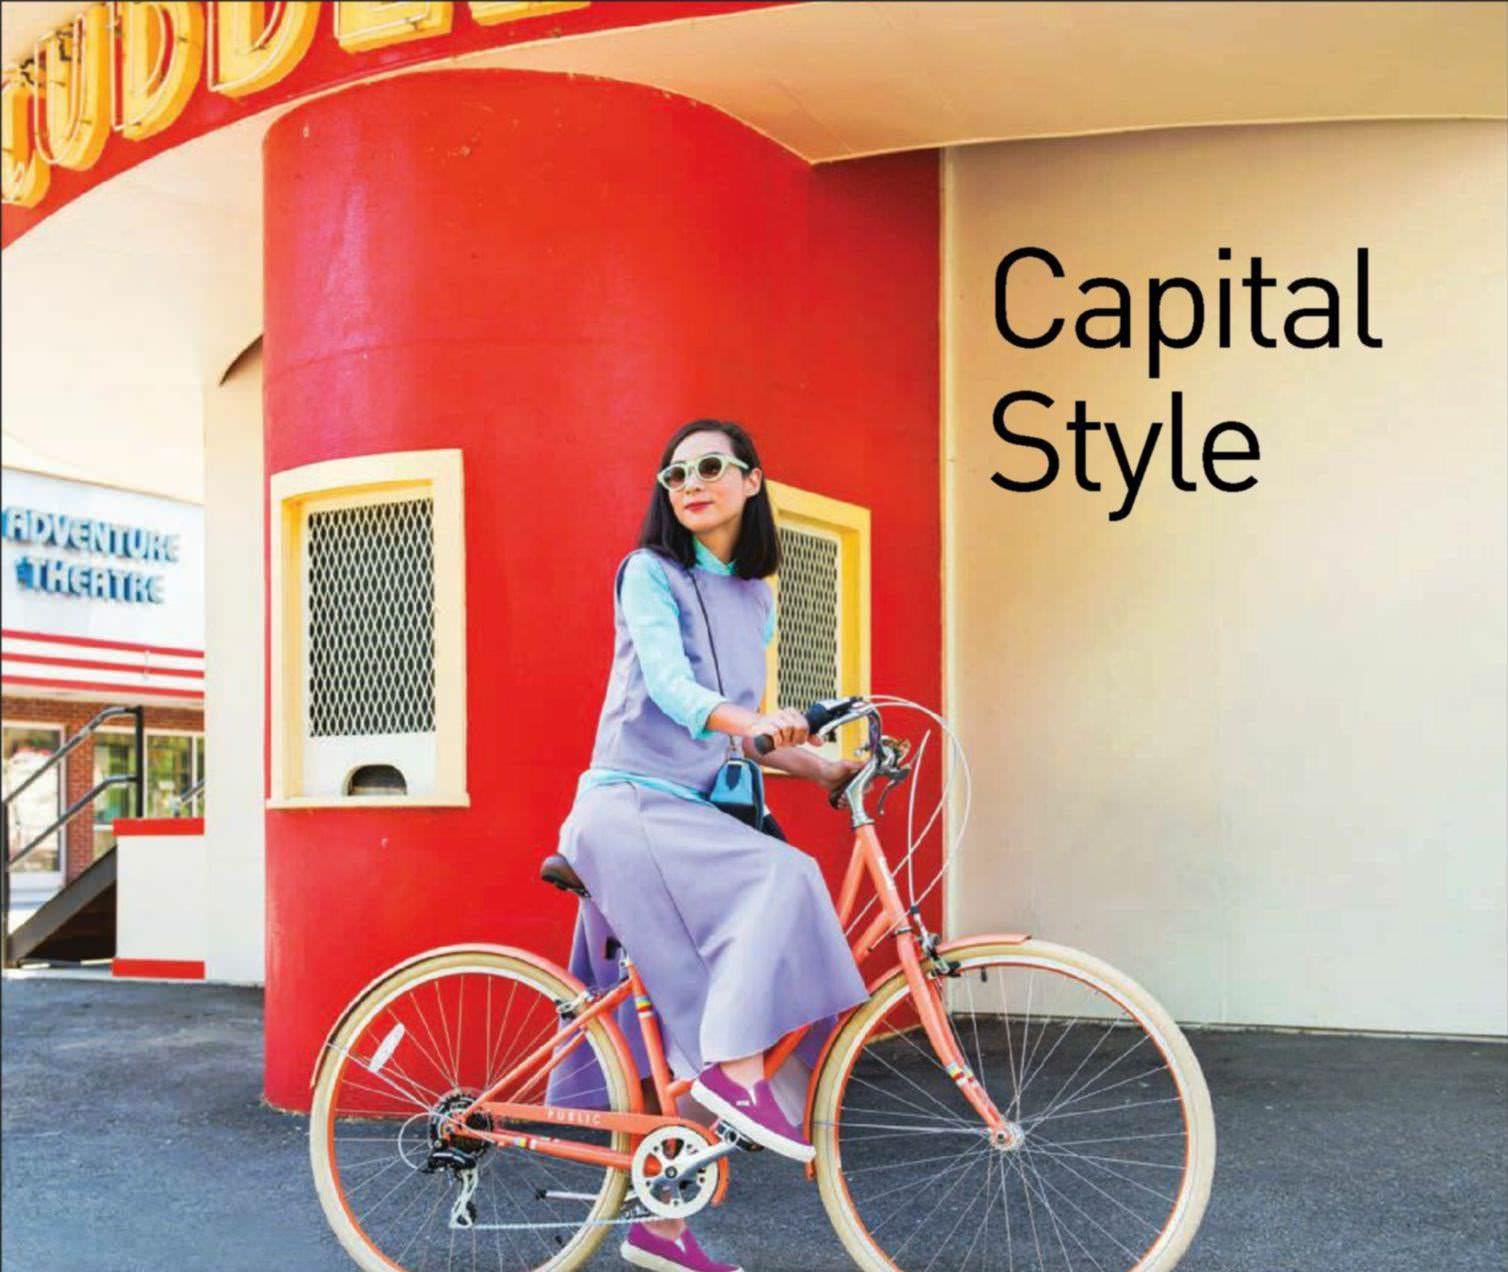 Capital Style